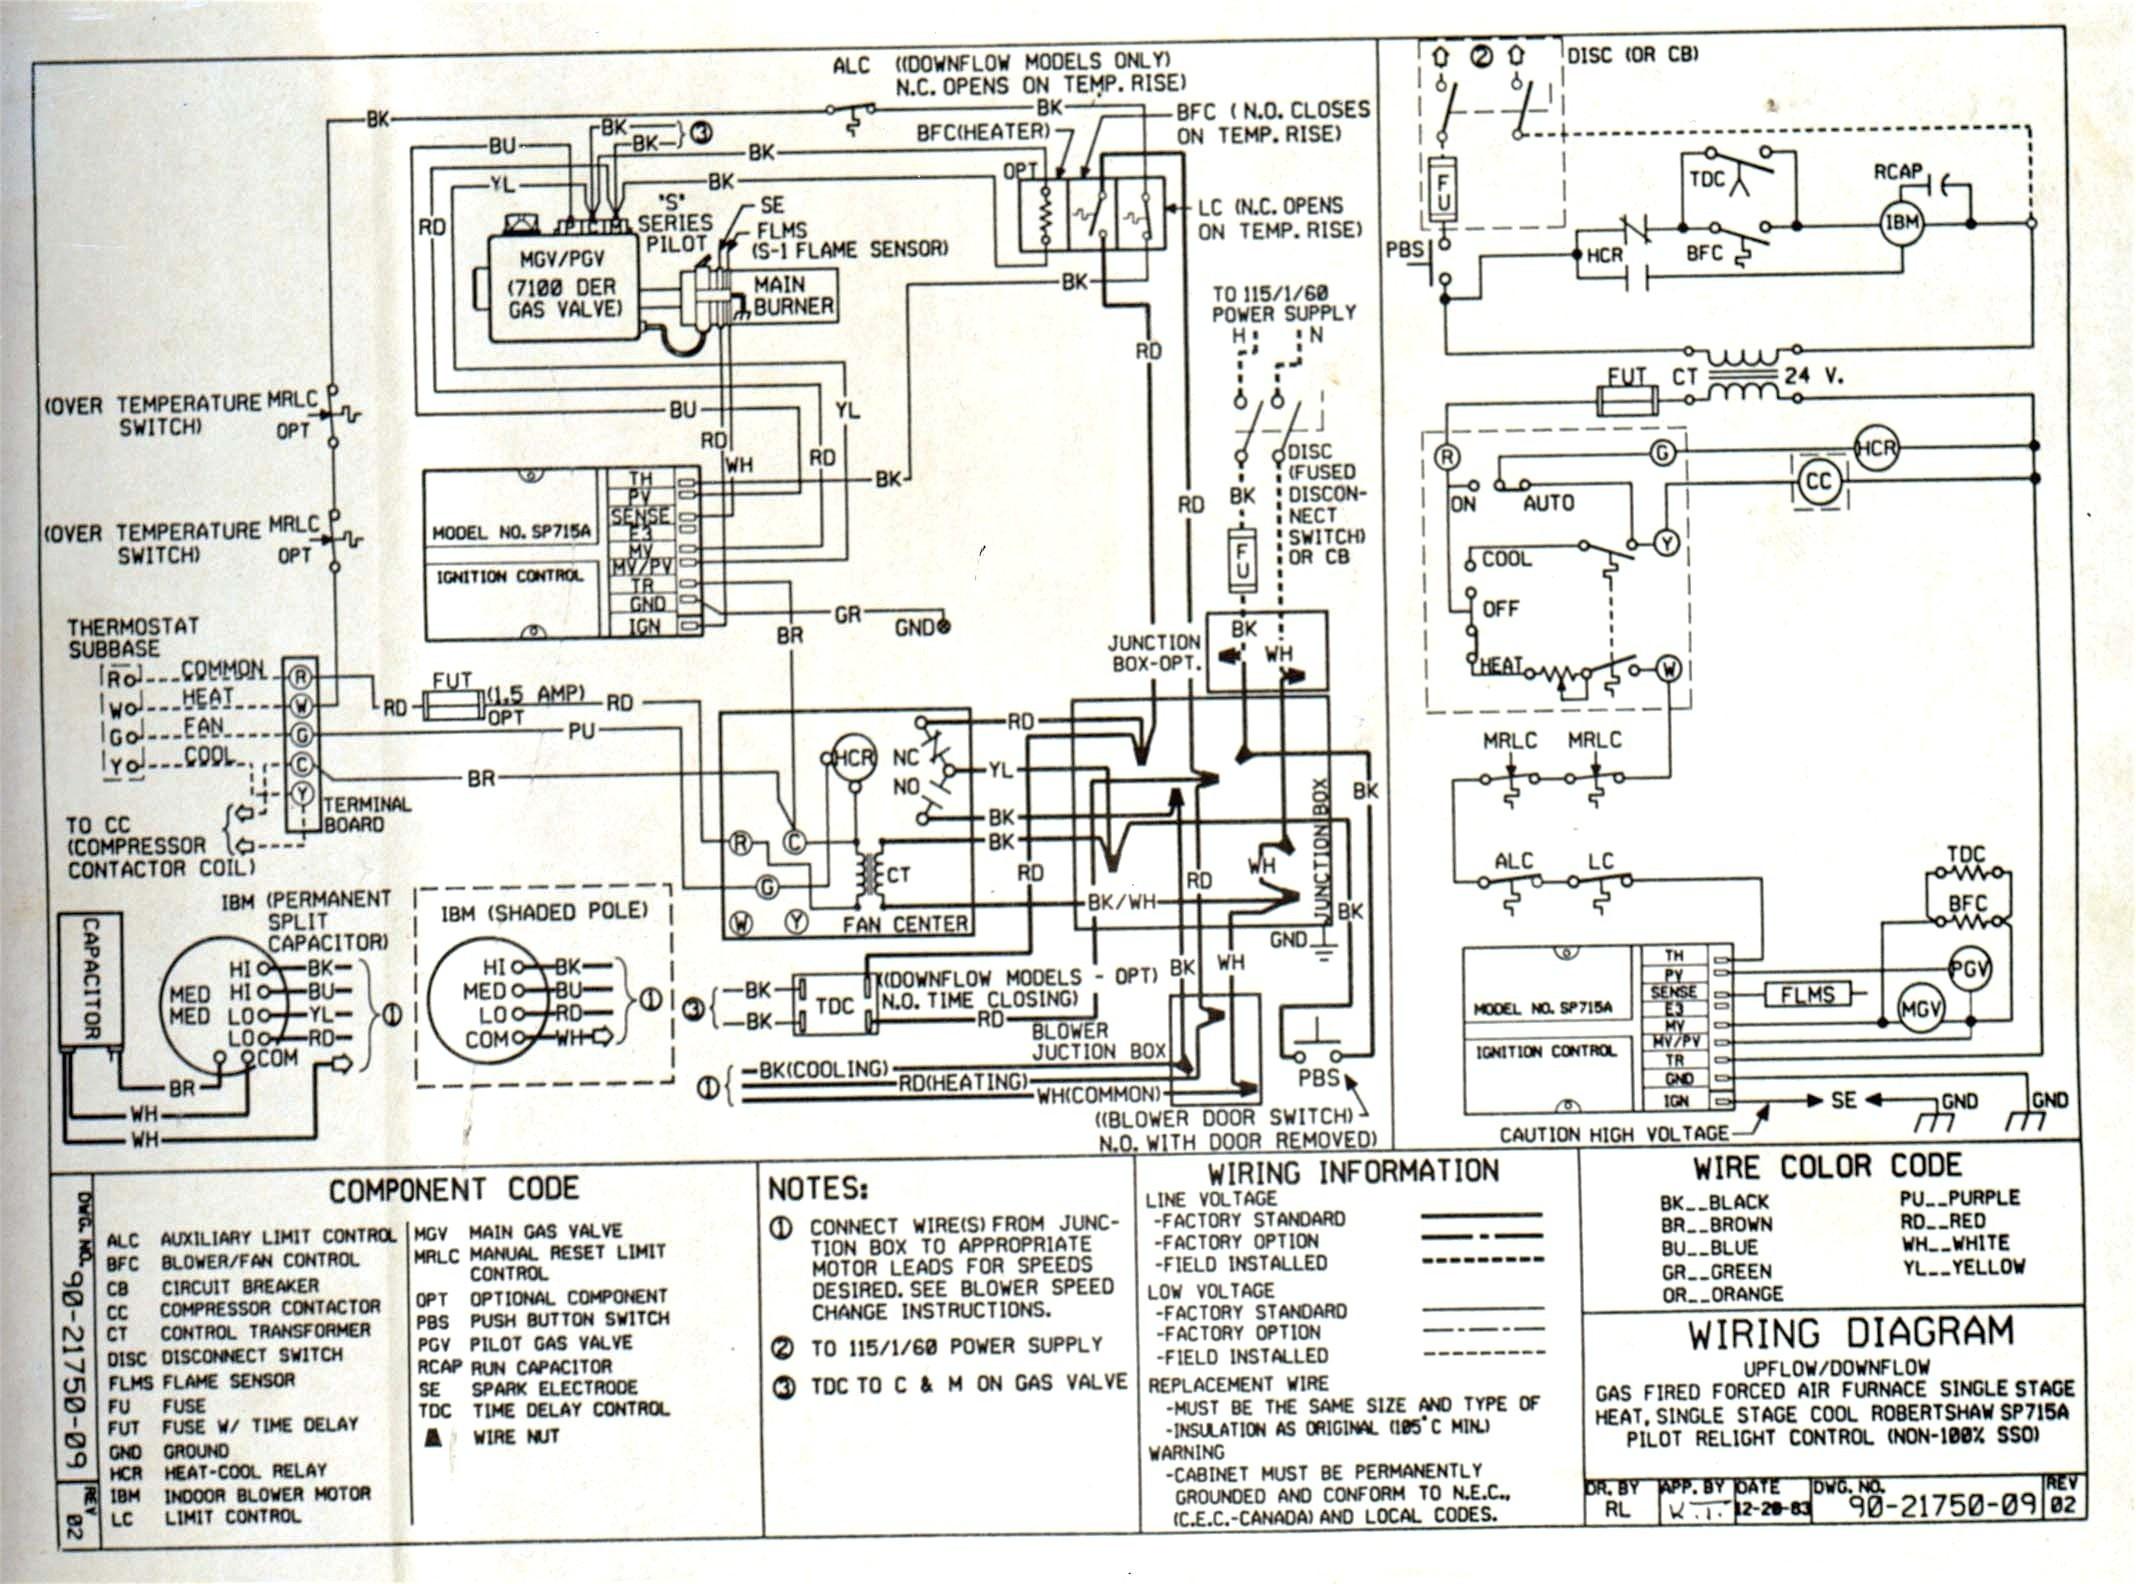 Wiring Diagram Air Conditioning pressor Fresh Wiring Diagram Ac Pressor New Mcquay Air Conditioner Wiring